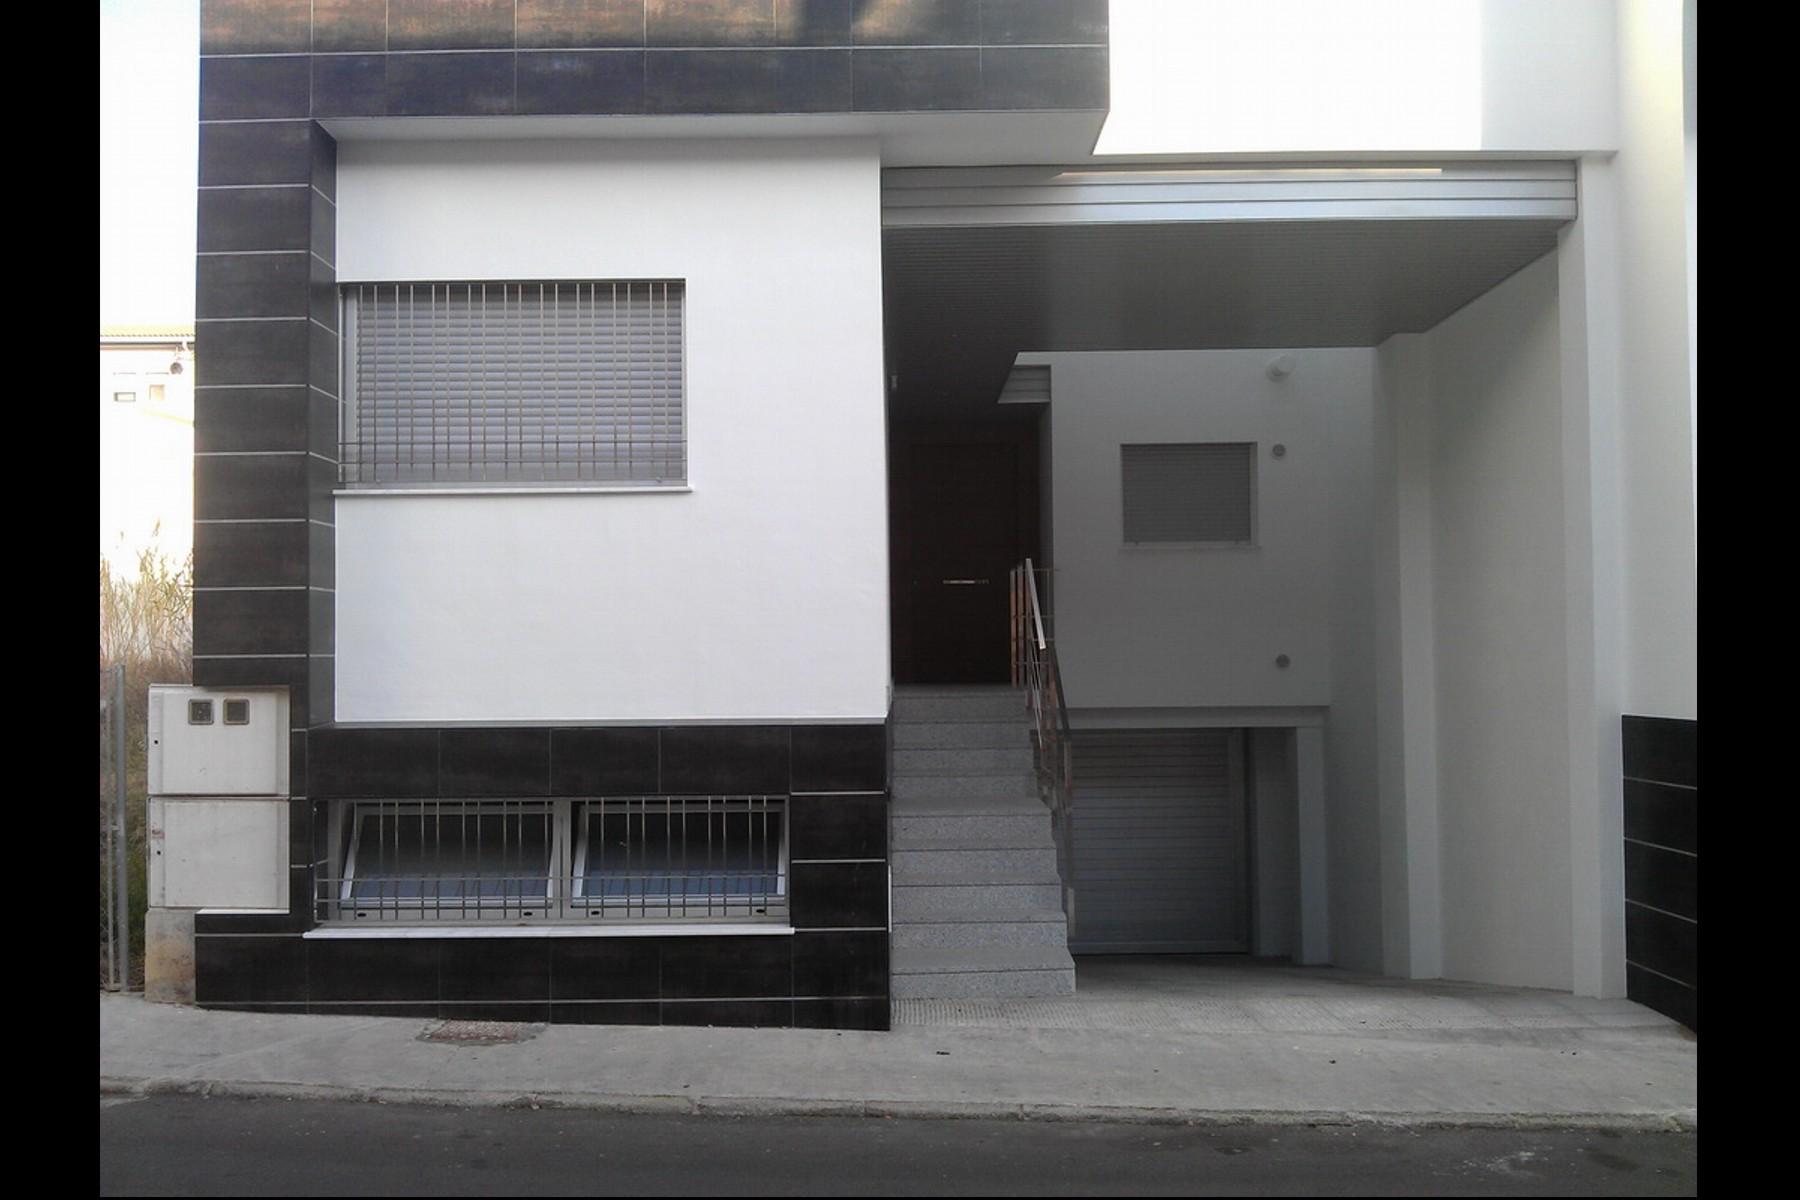 Imaginarq-243-Vivienda-unifamiliar-Pego-Alicante-36A